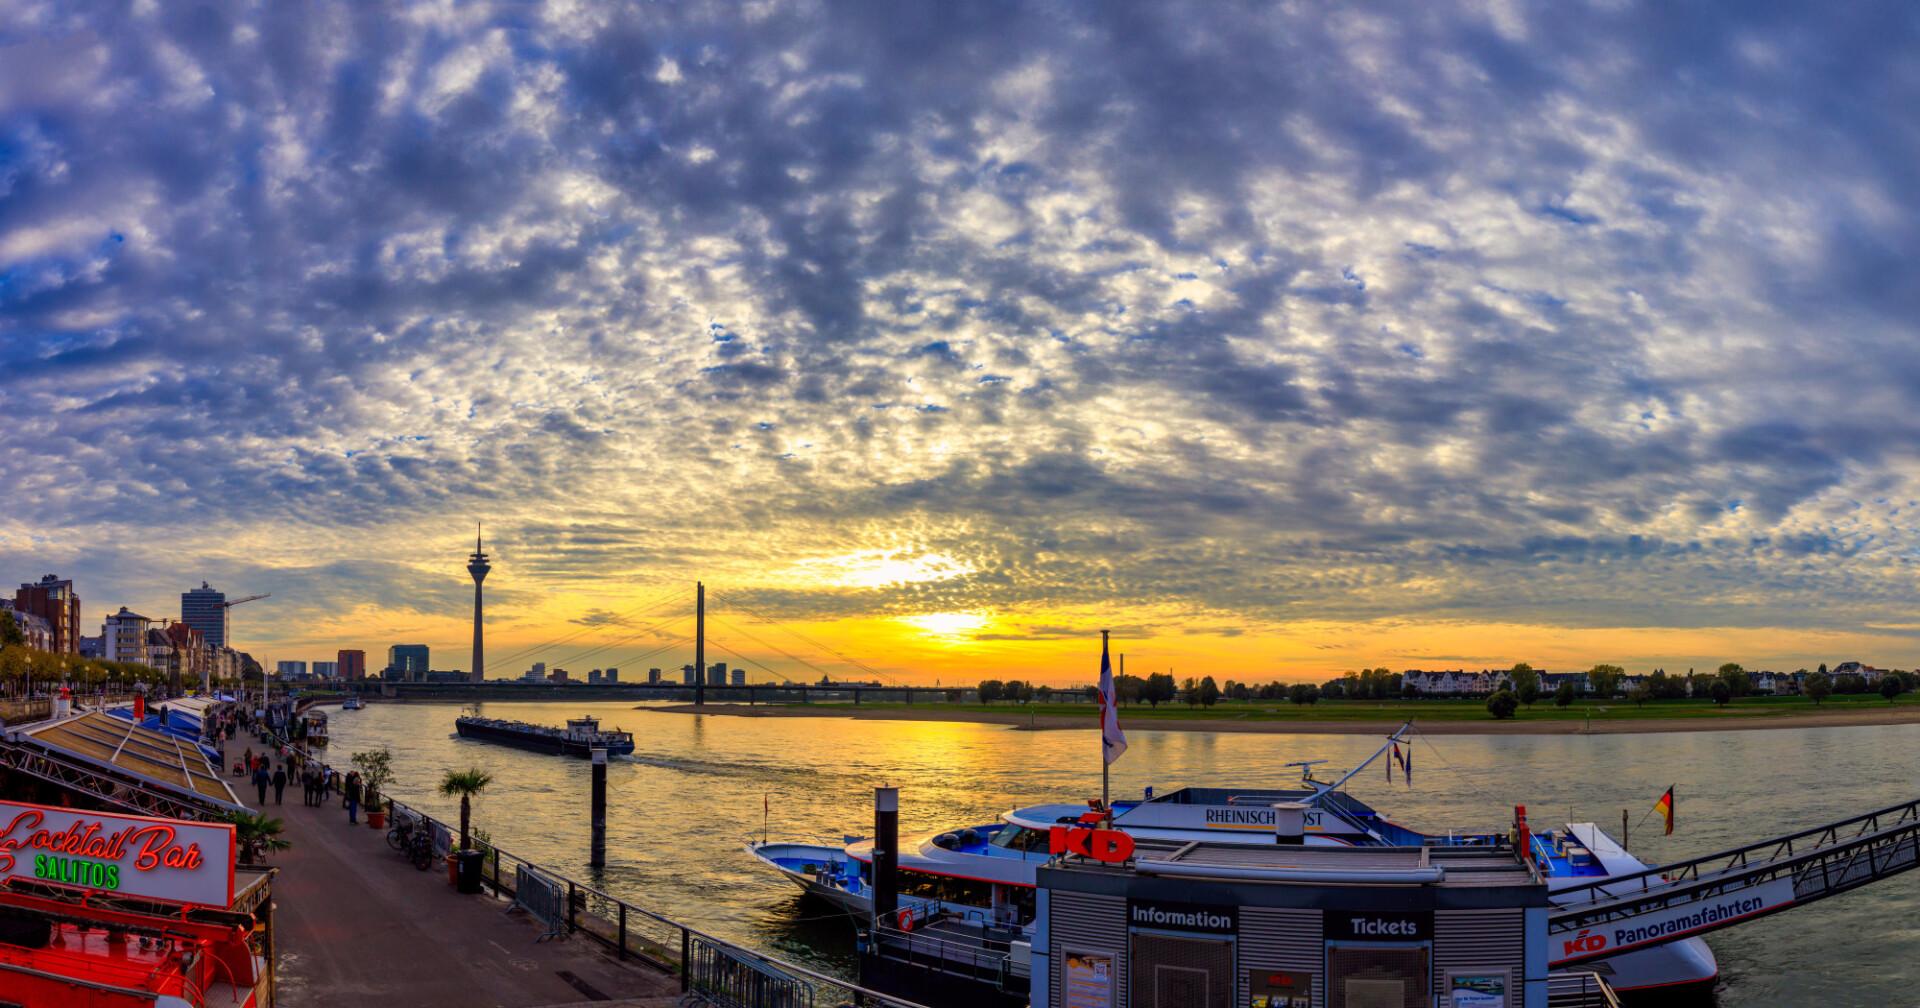 Dusseldorf on the Rhine at sunset